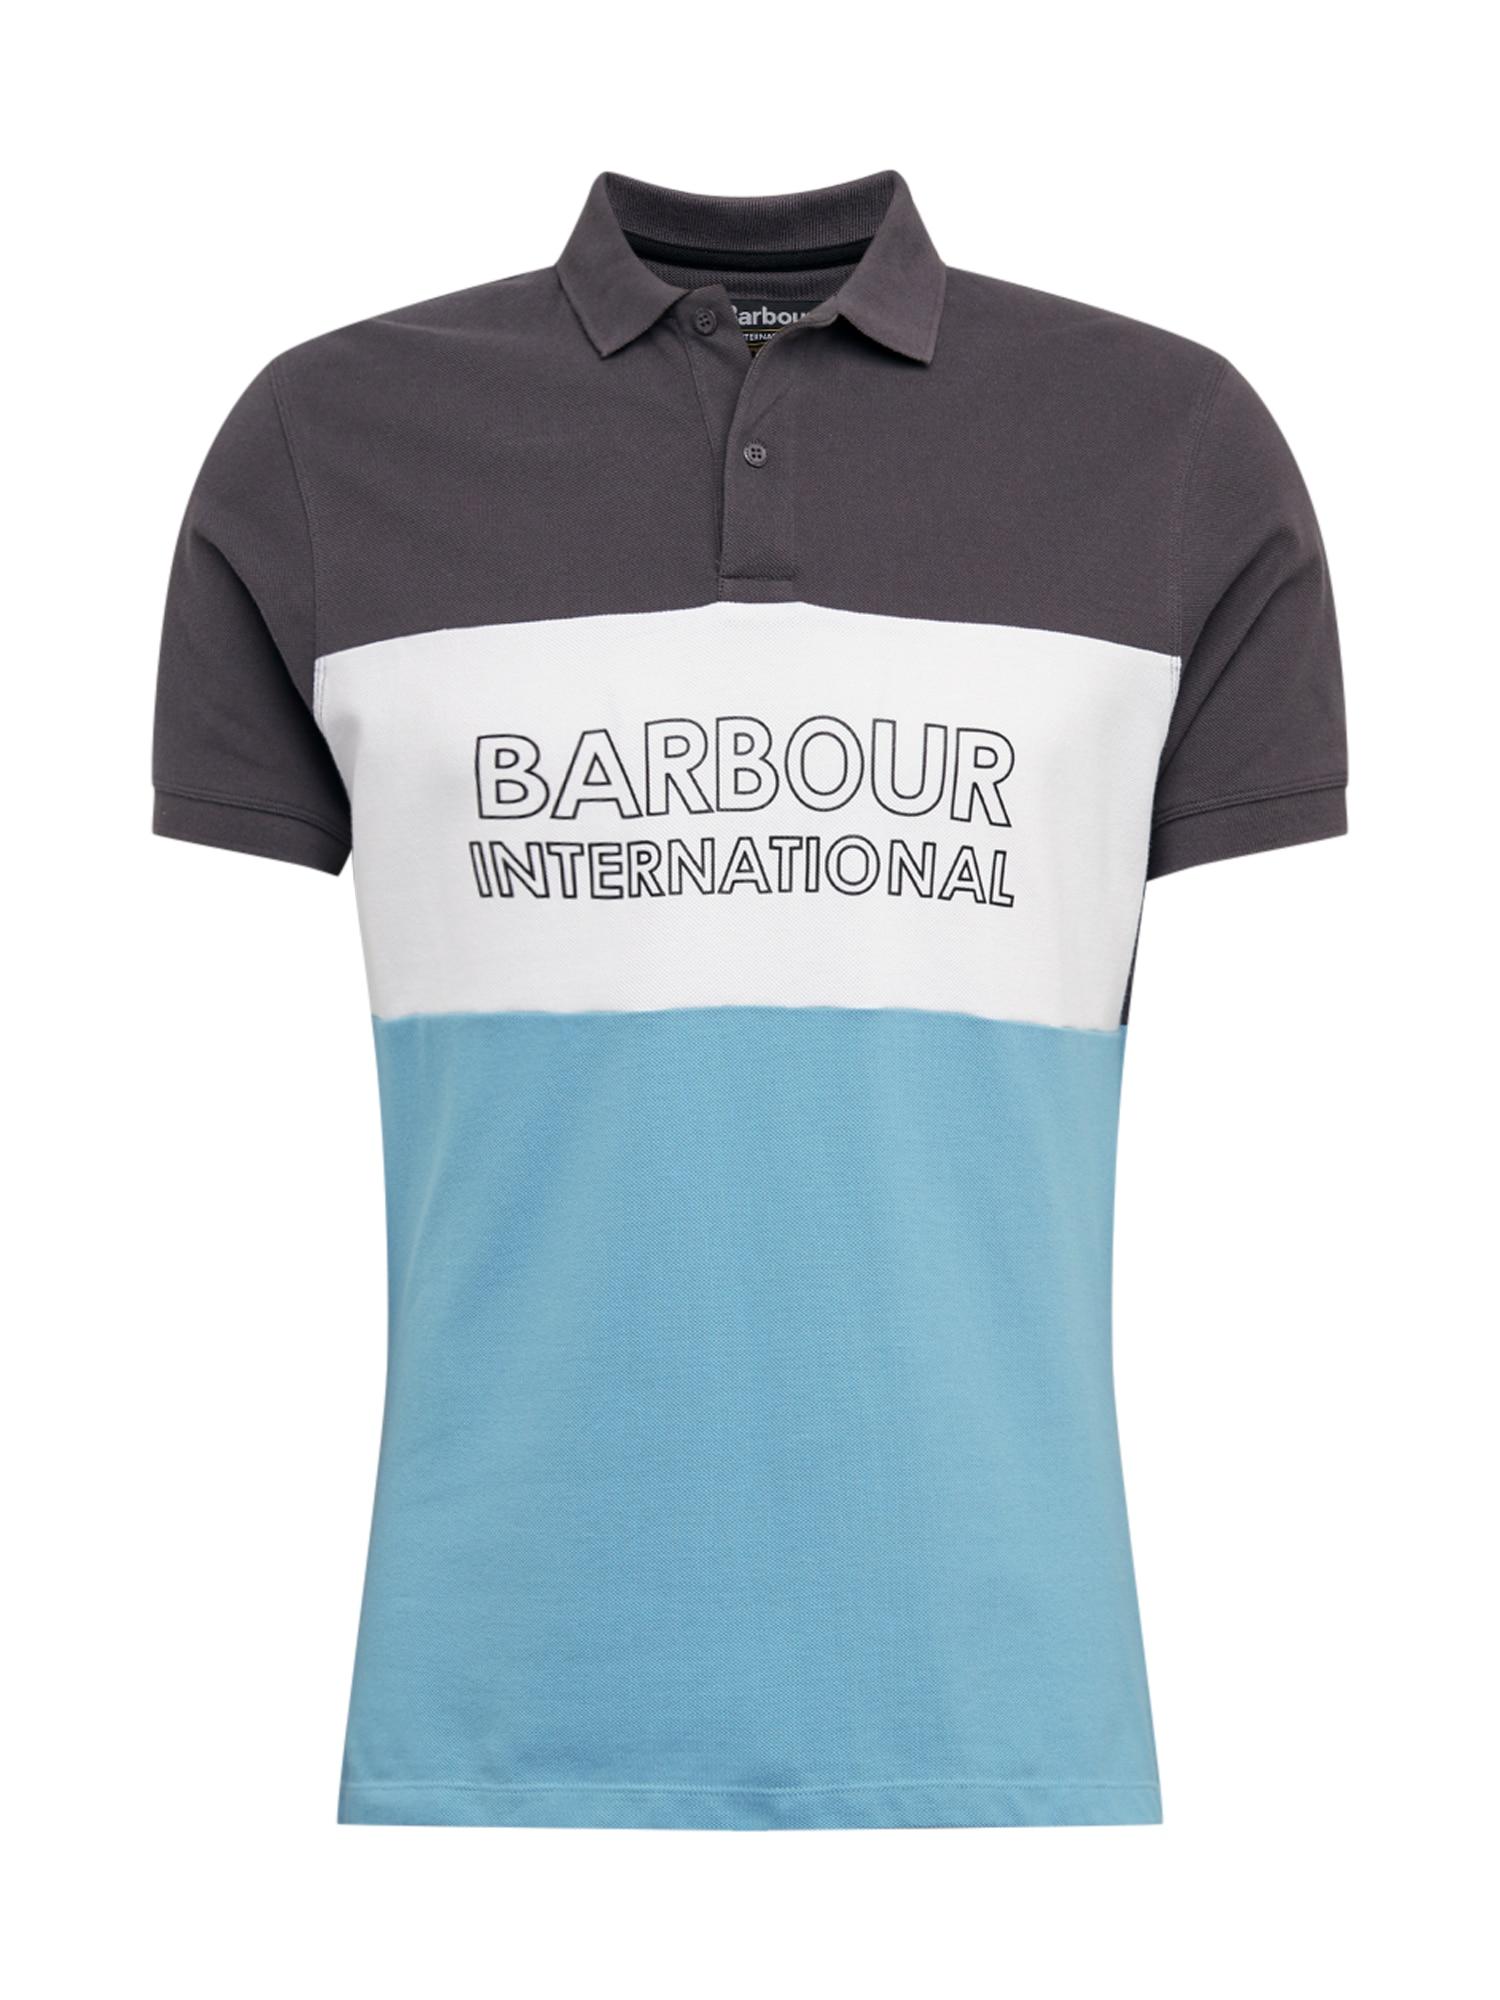 Barbour International Marškinėliai 'B.intl Bold' mėlyna / tamsiai pilka / balta